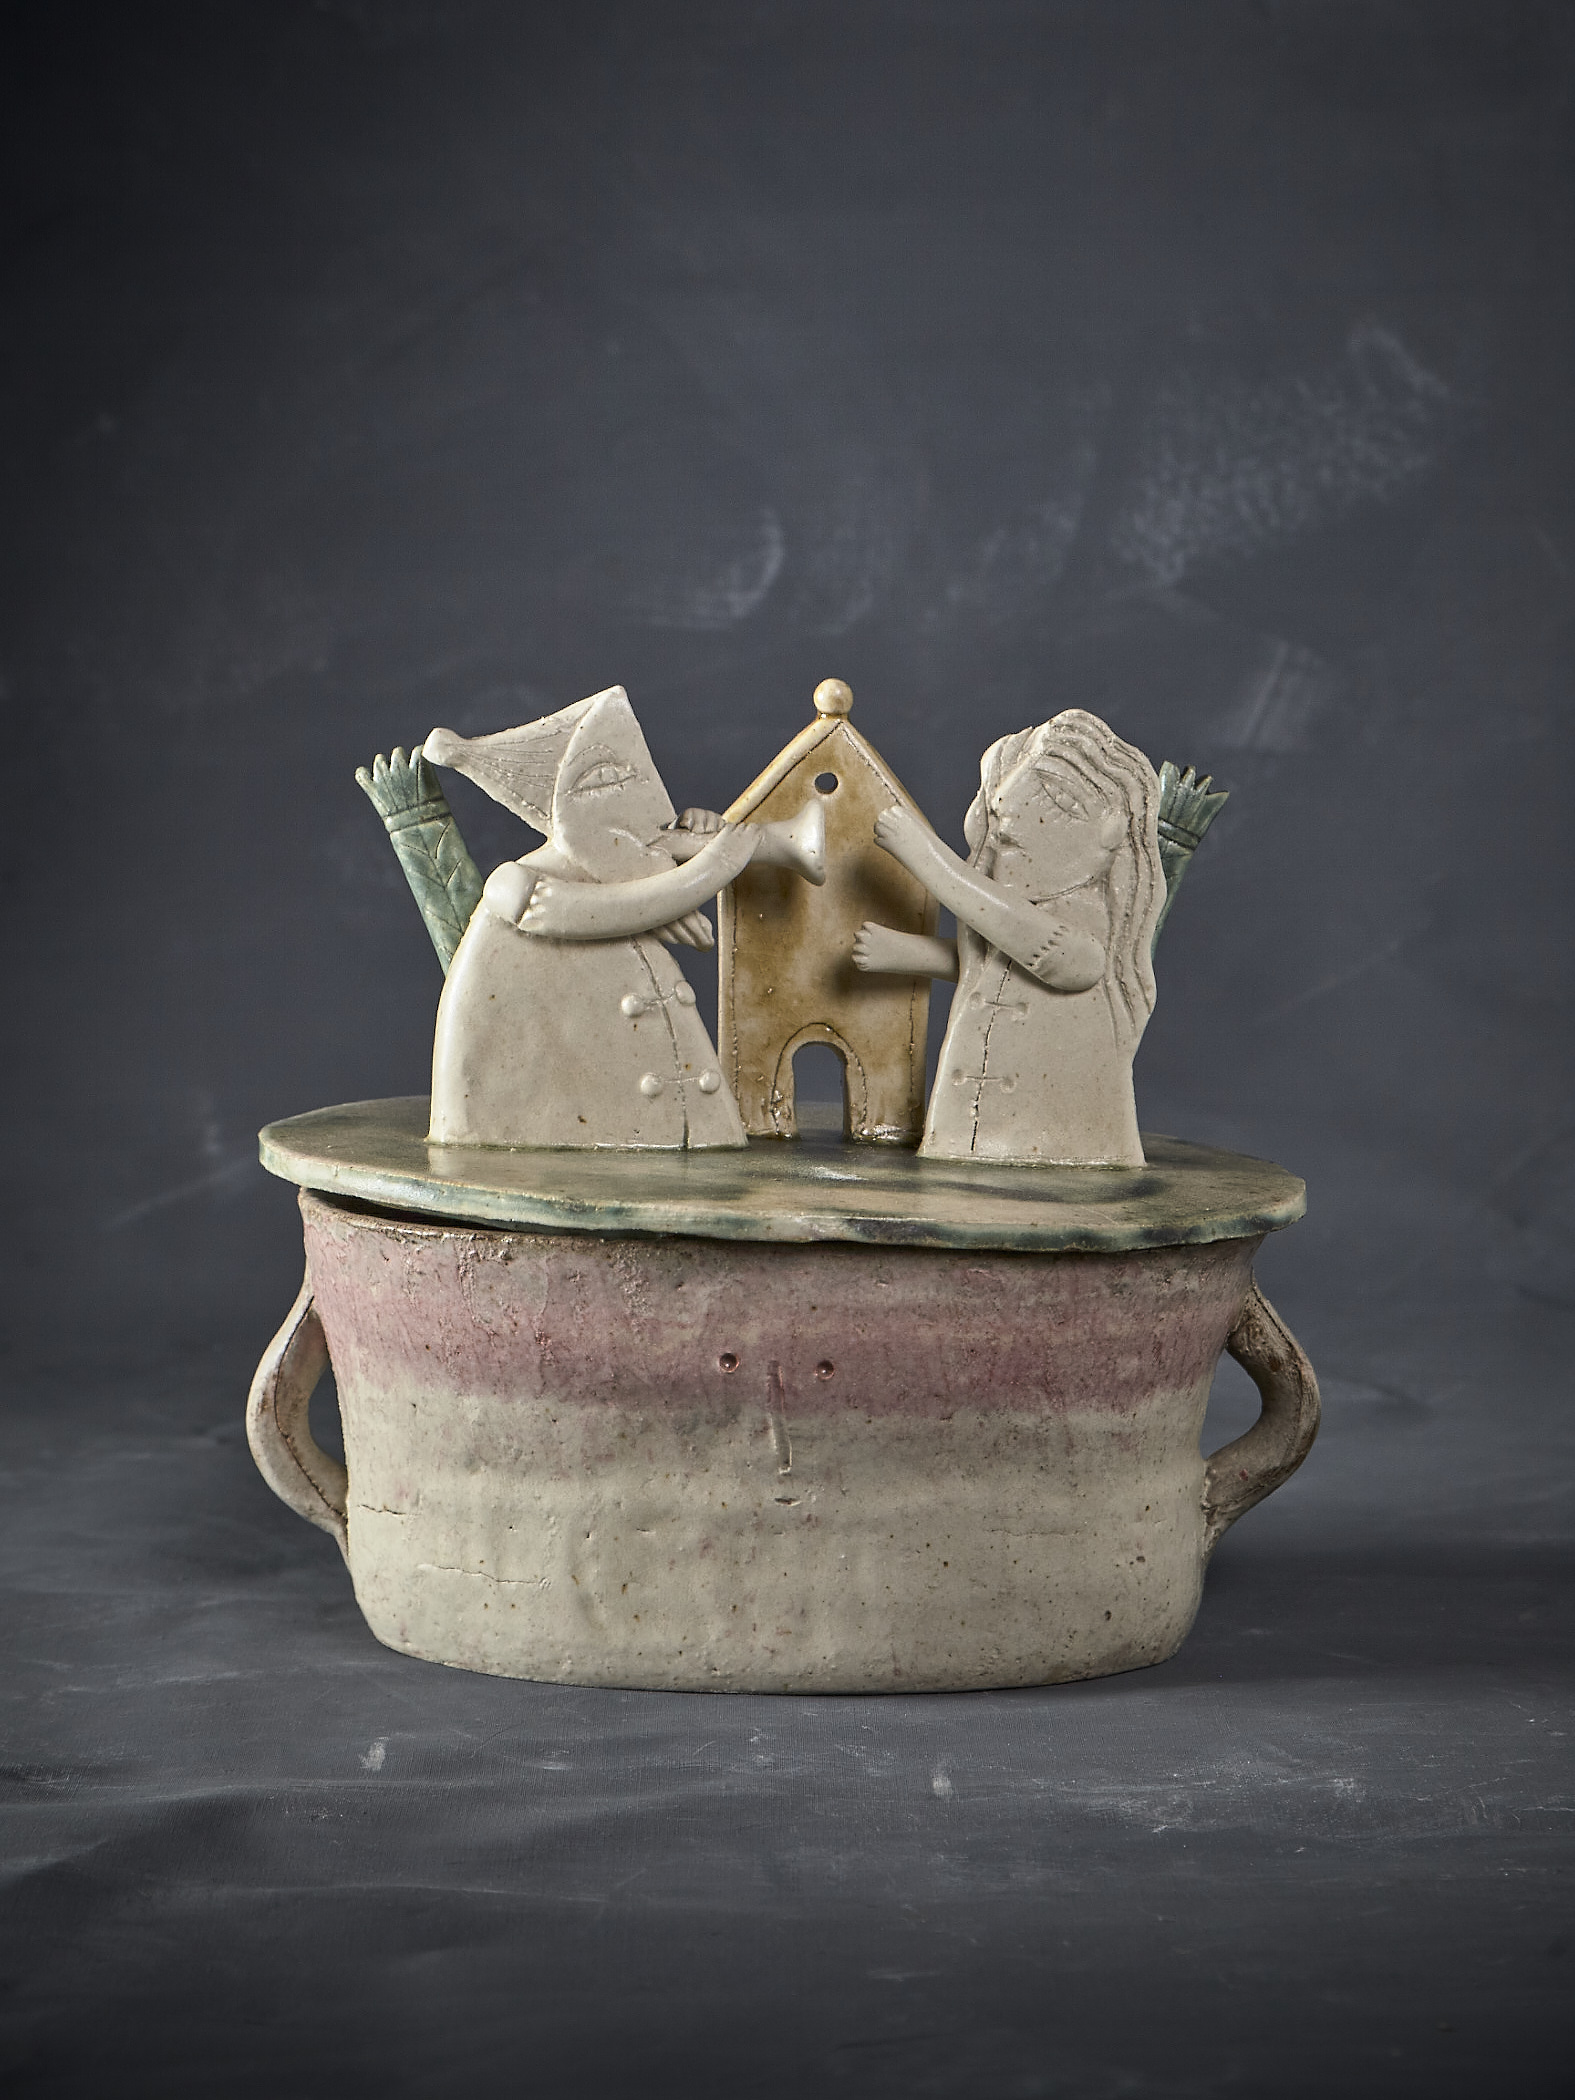 Ceramiche Riccardo Biavati per Messisbugo